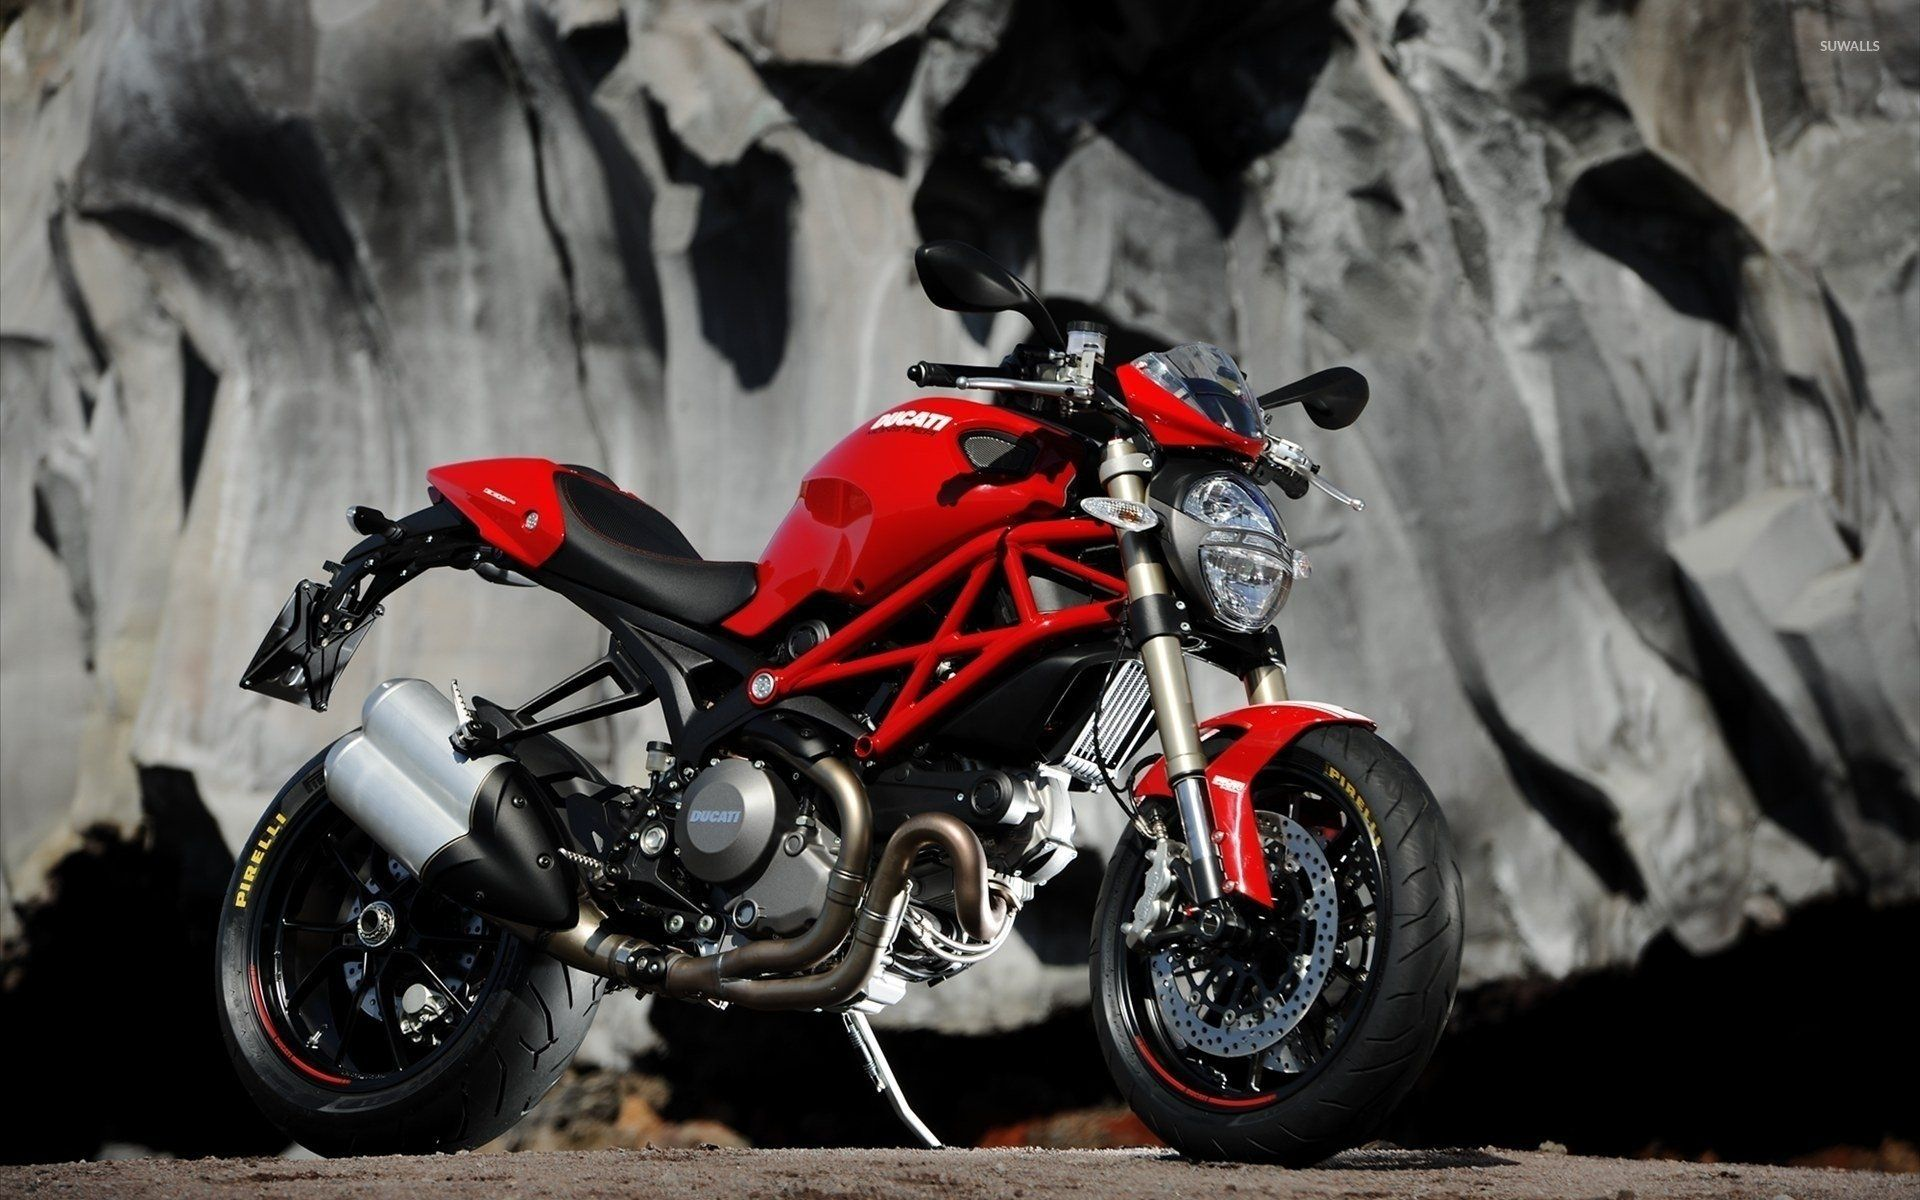 Ducati Monster HD Wallpaper From